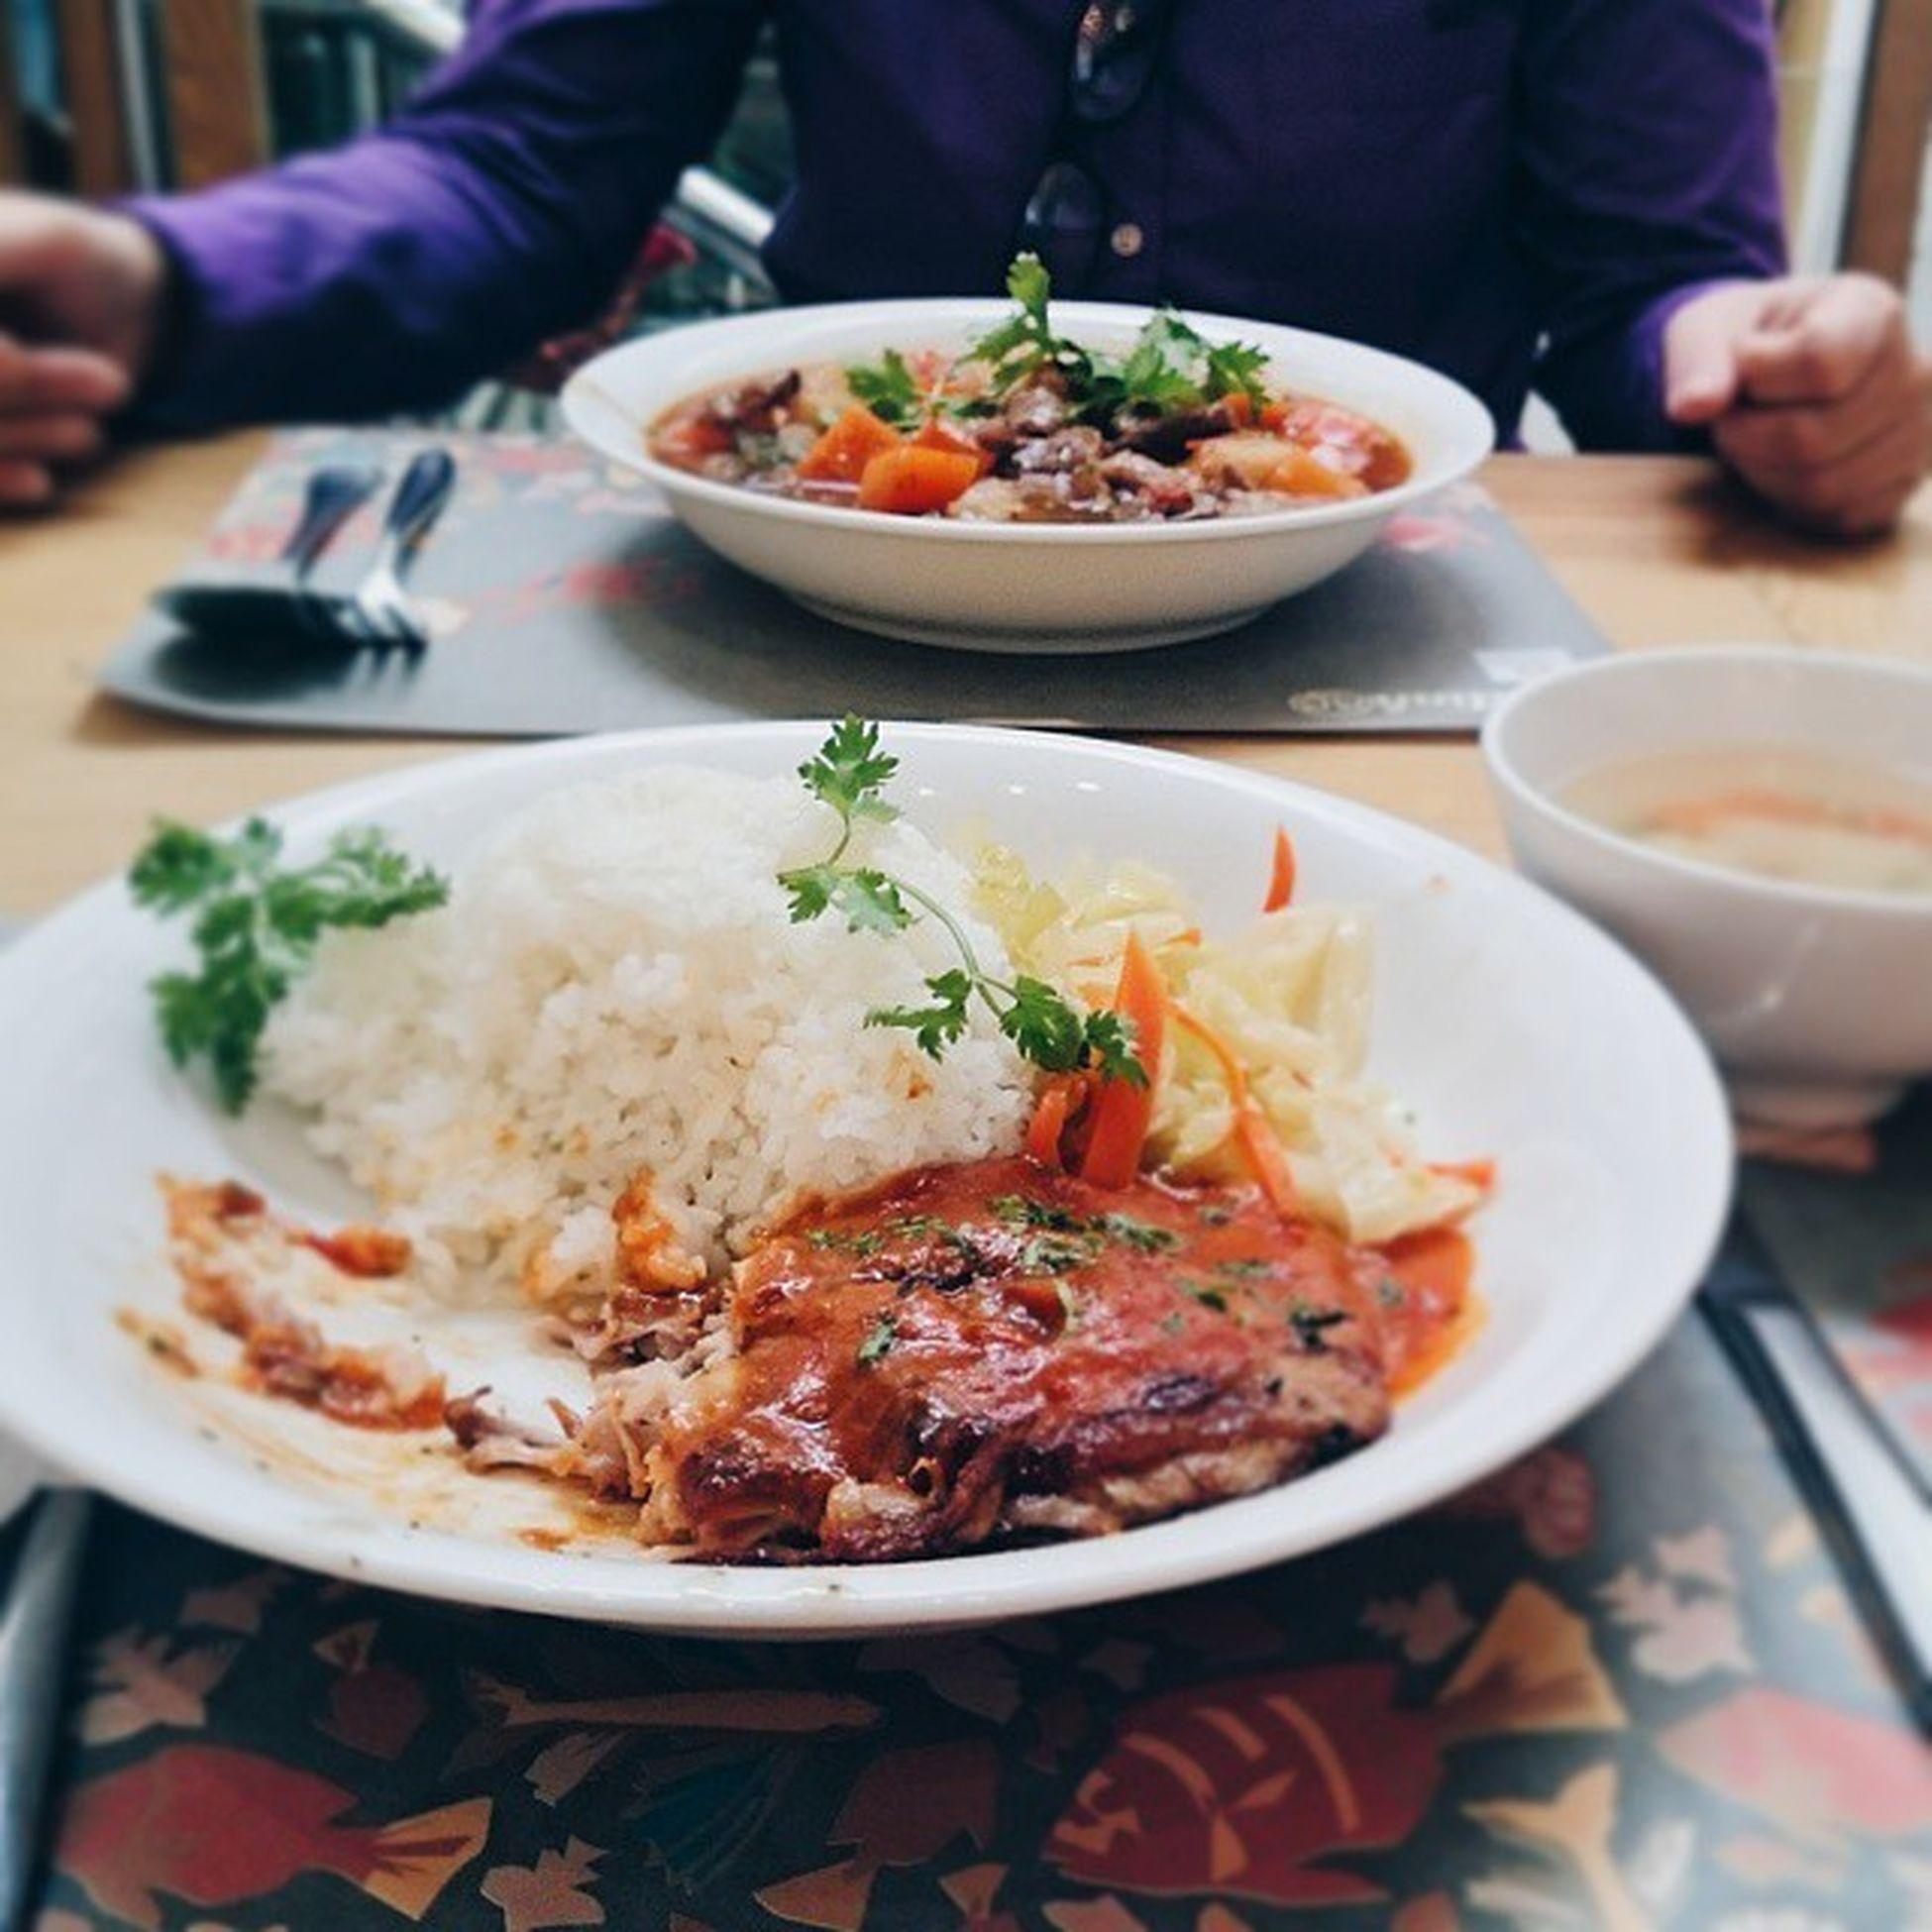 Bác sĩ hỏi tui có sút cân đi k đó 😳😳😳 Susfoodtrip Rice Chicken Spicy Sauce Beef Casserole Yummy With Mommy Homecookbb Masterchefvn Lozihn Lozi Foodporn Foodyhanoi Vscocam